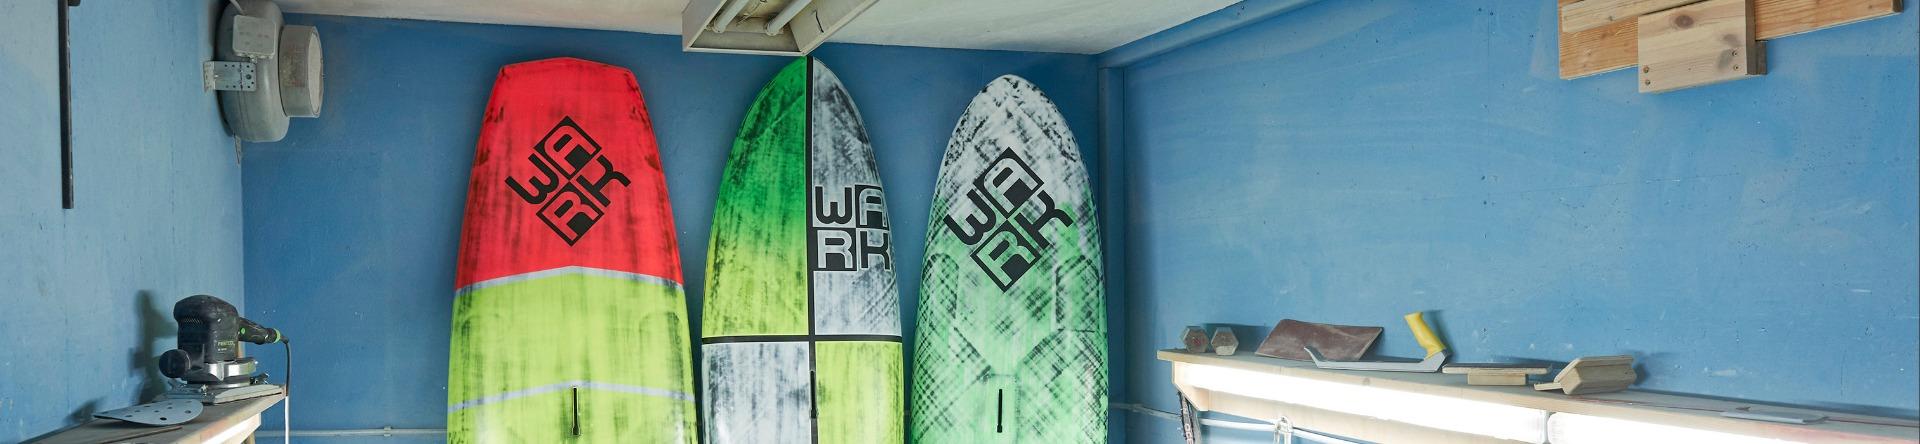 WARK Surfboards